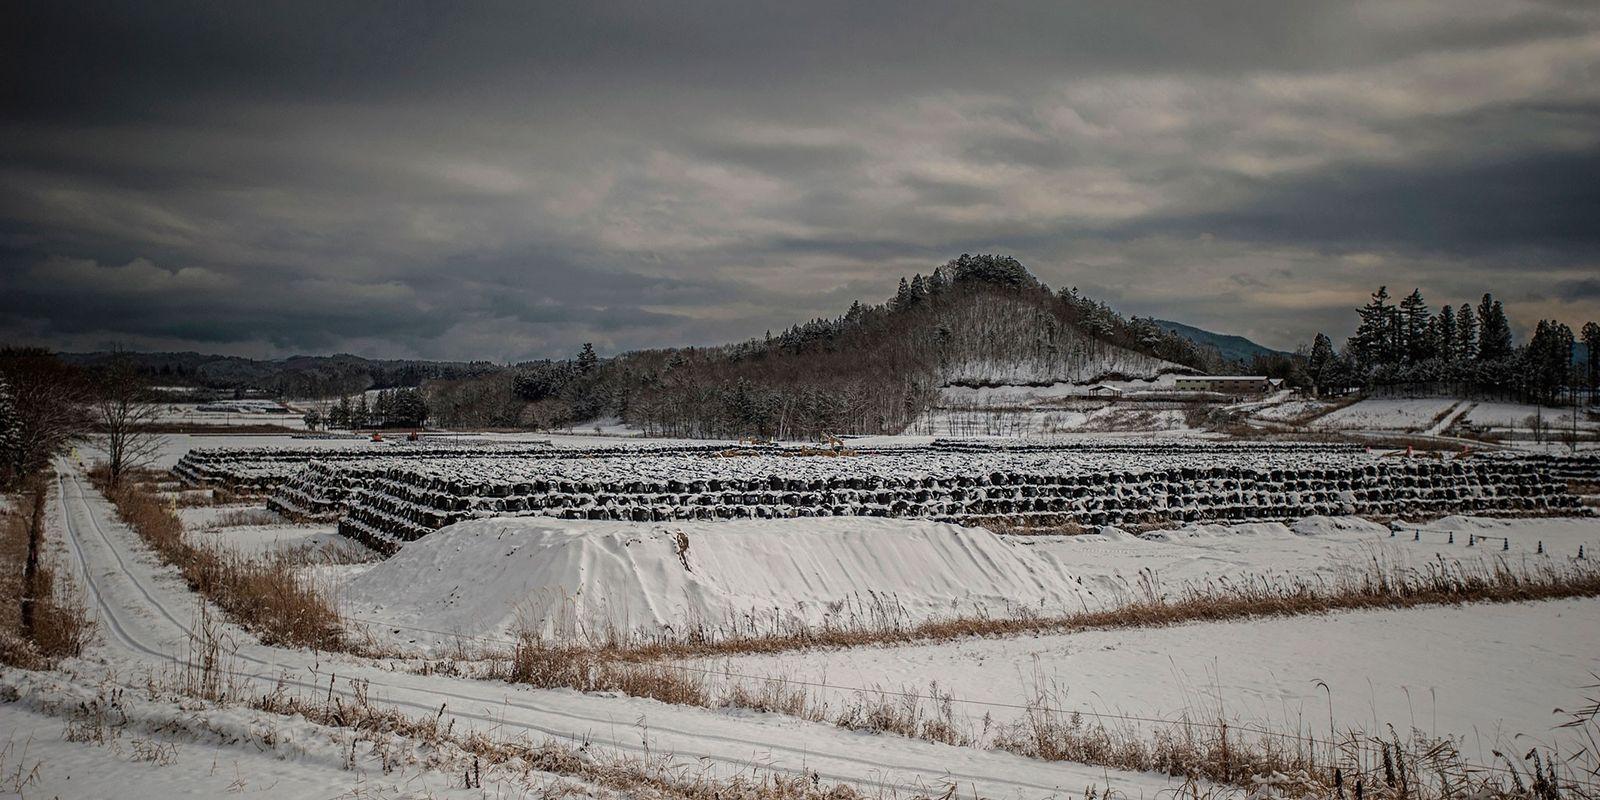 Fotos macabras das cidades fantasmas de Fukushima